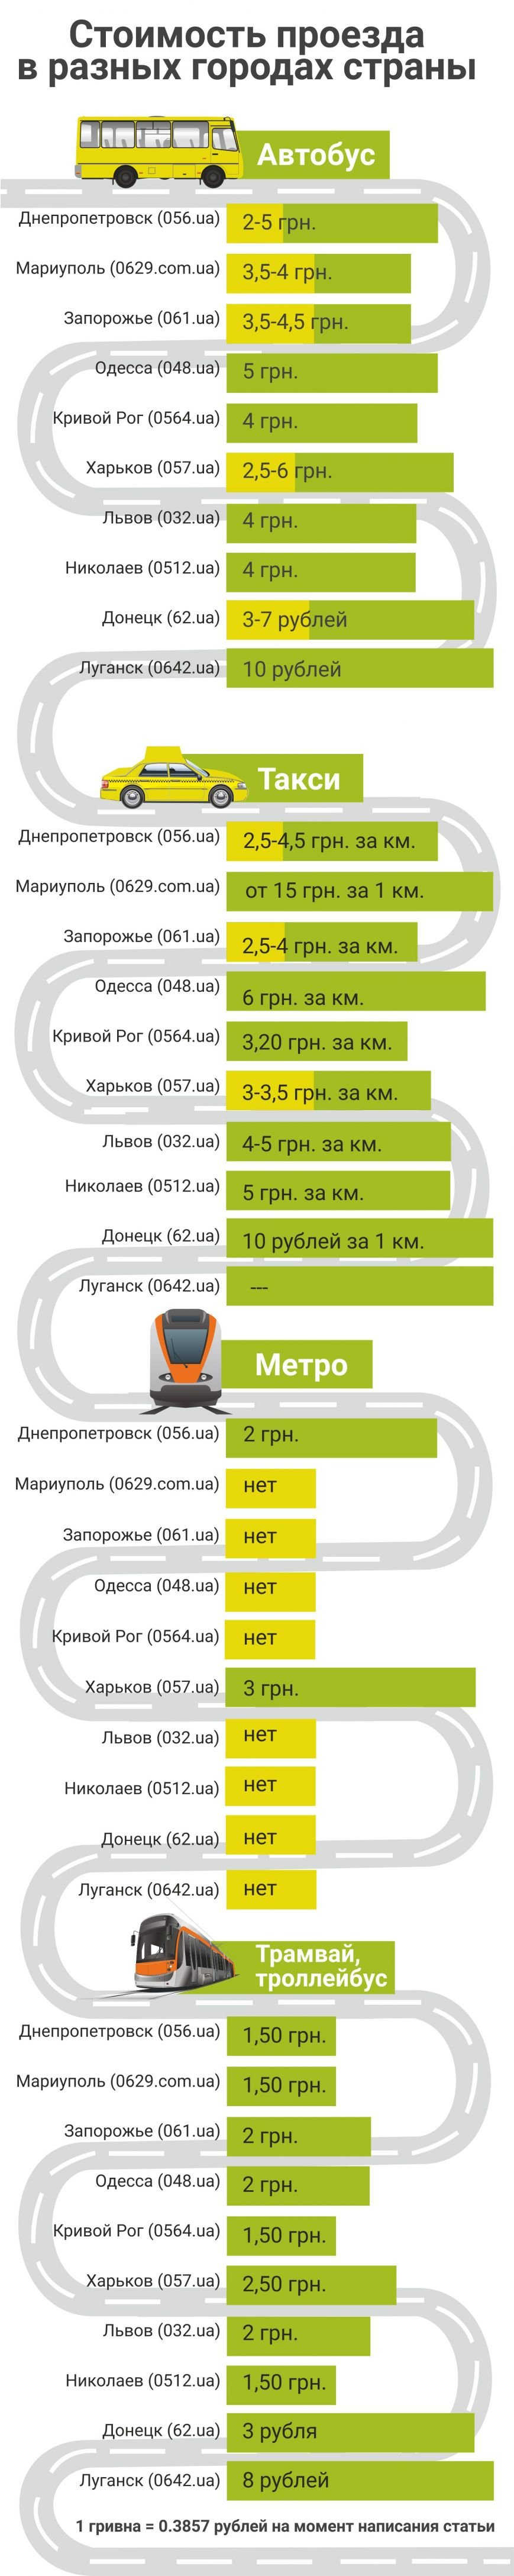 Транспорт инфографика